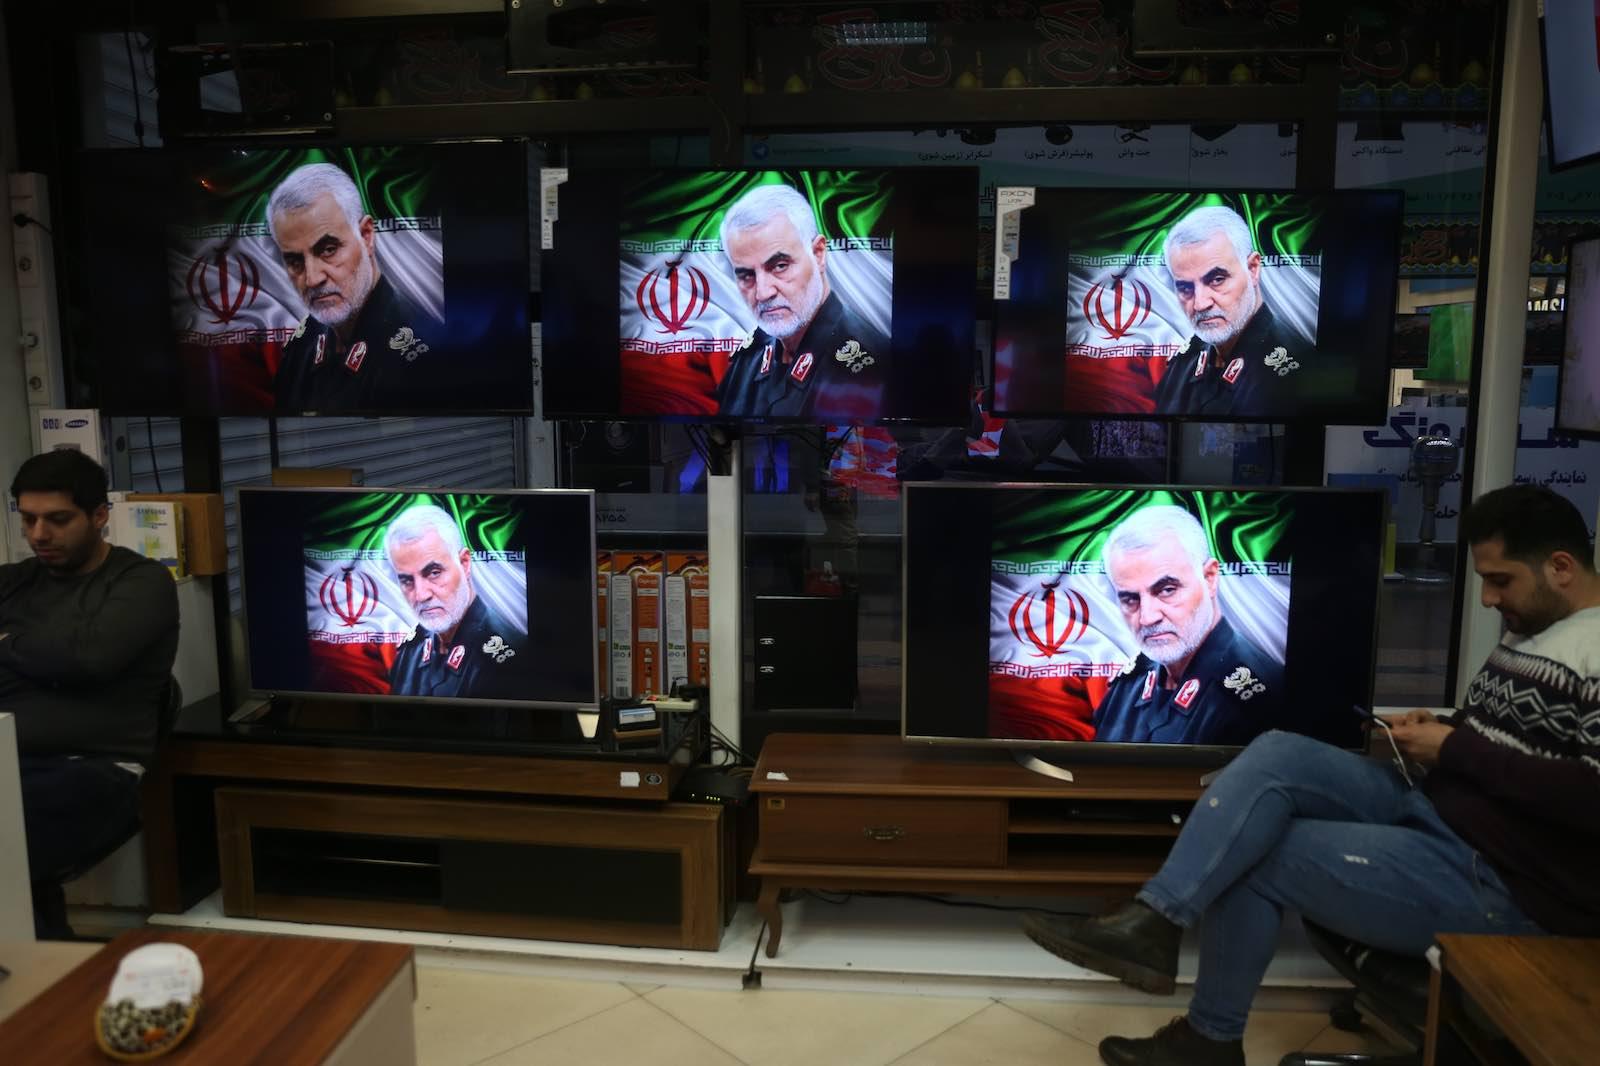 Iranian revolutionary guard General Qaseem Soleimani is lionised in Tehran (Photo: Majid Saeedi/Getty Images)